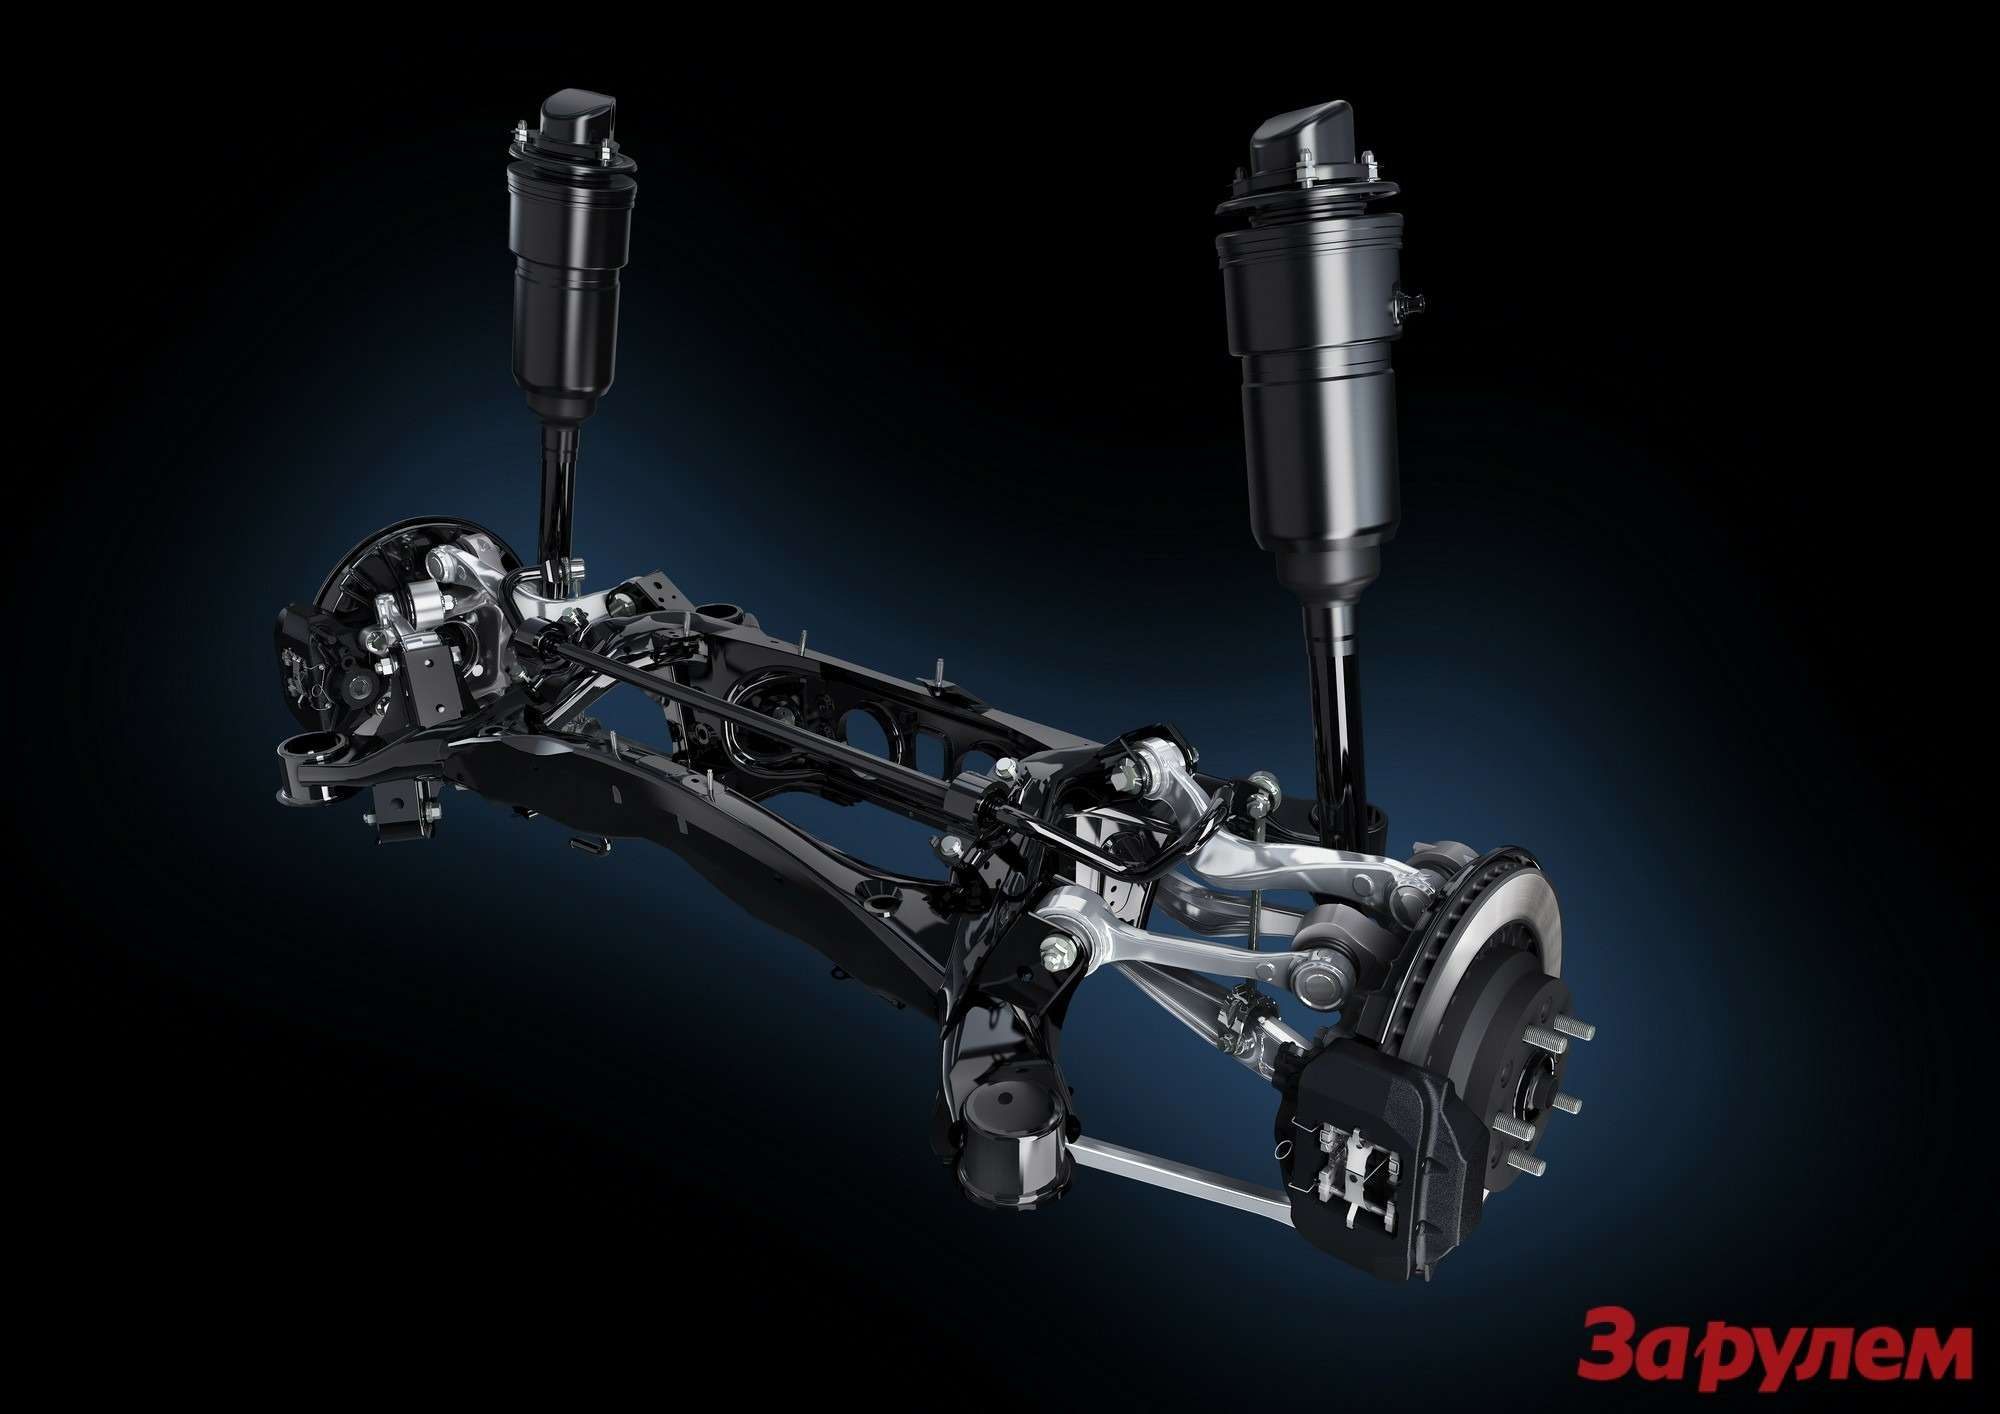 LS2013 Rear Air Suspension